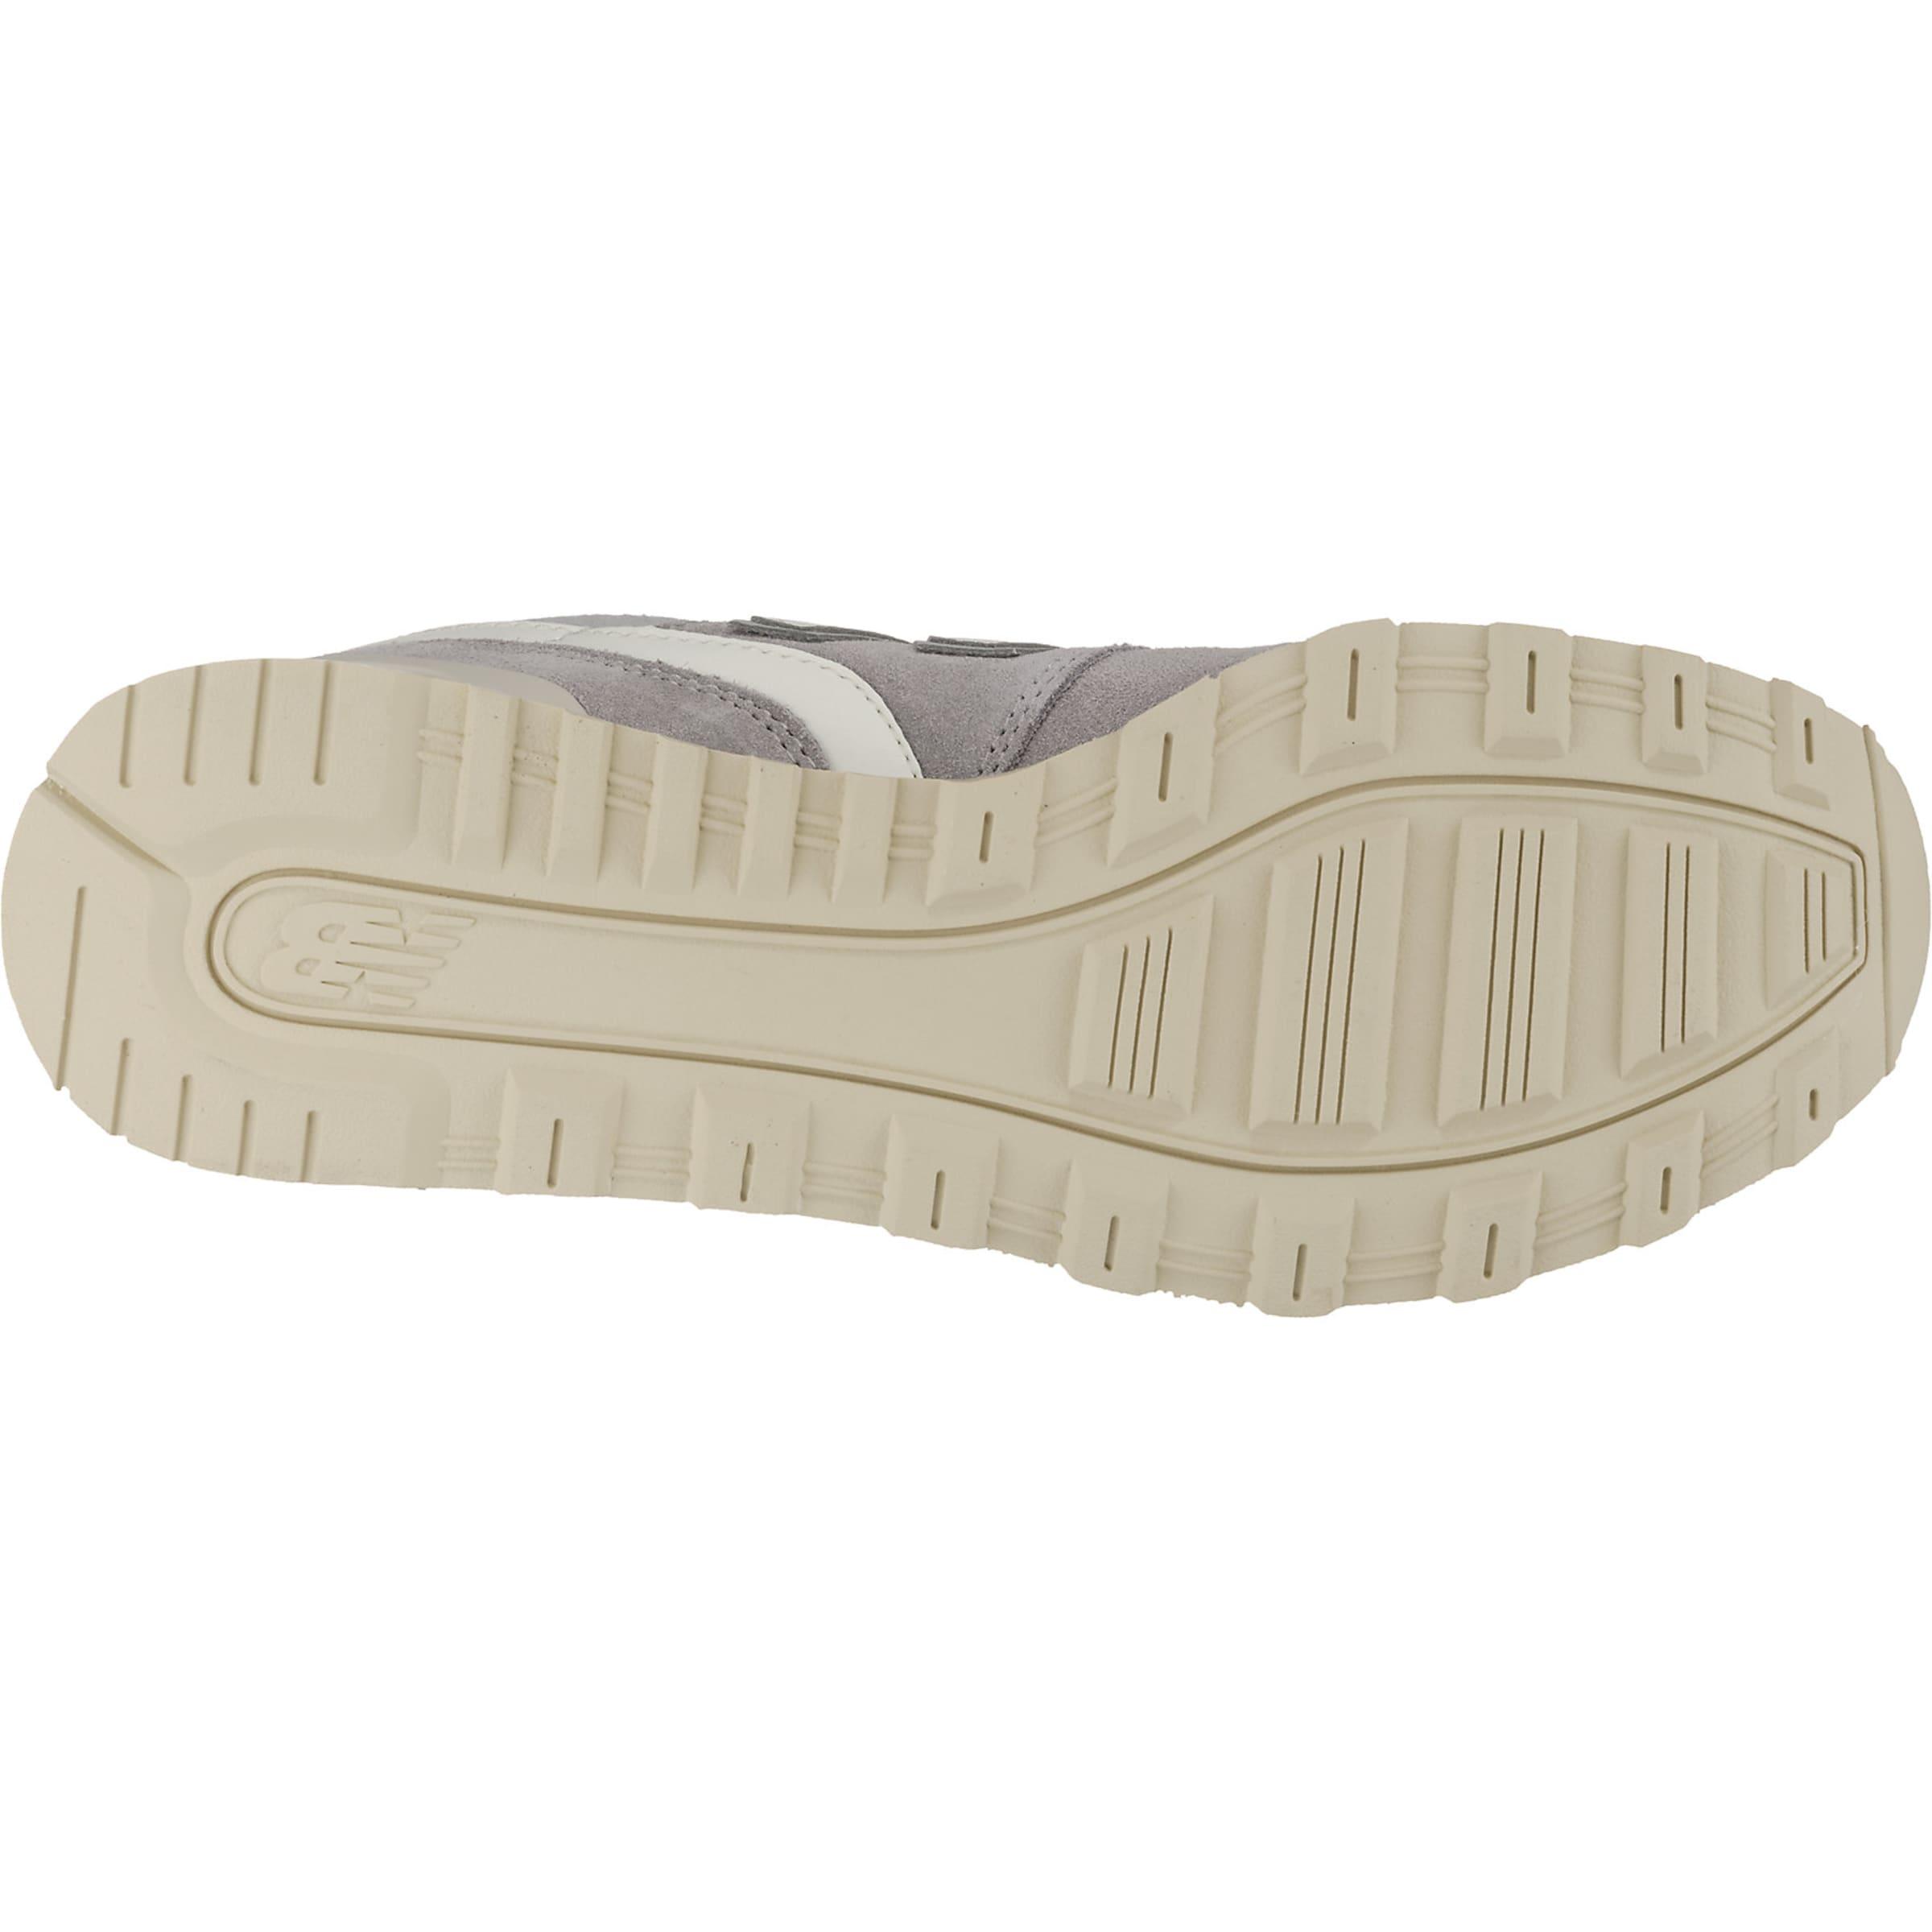 '996' CappuccinoGrau In Sneaker New Balance pUGzMqVS